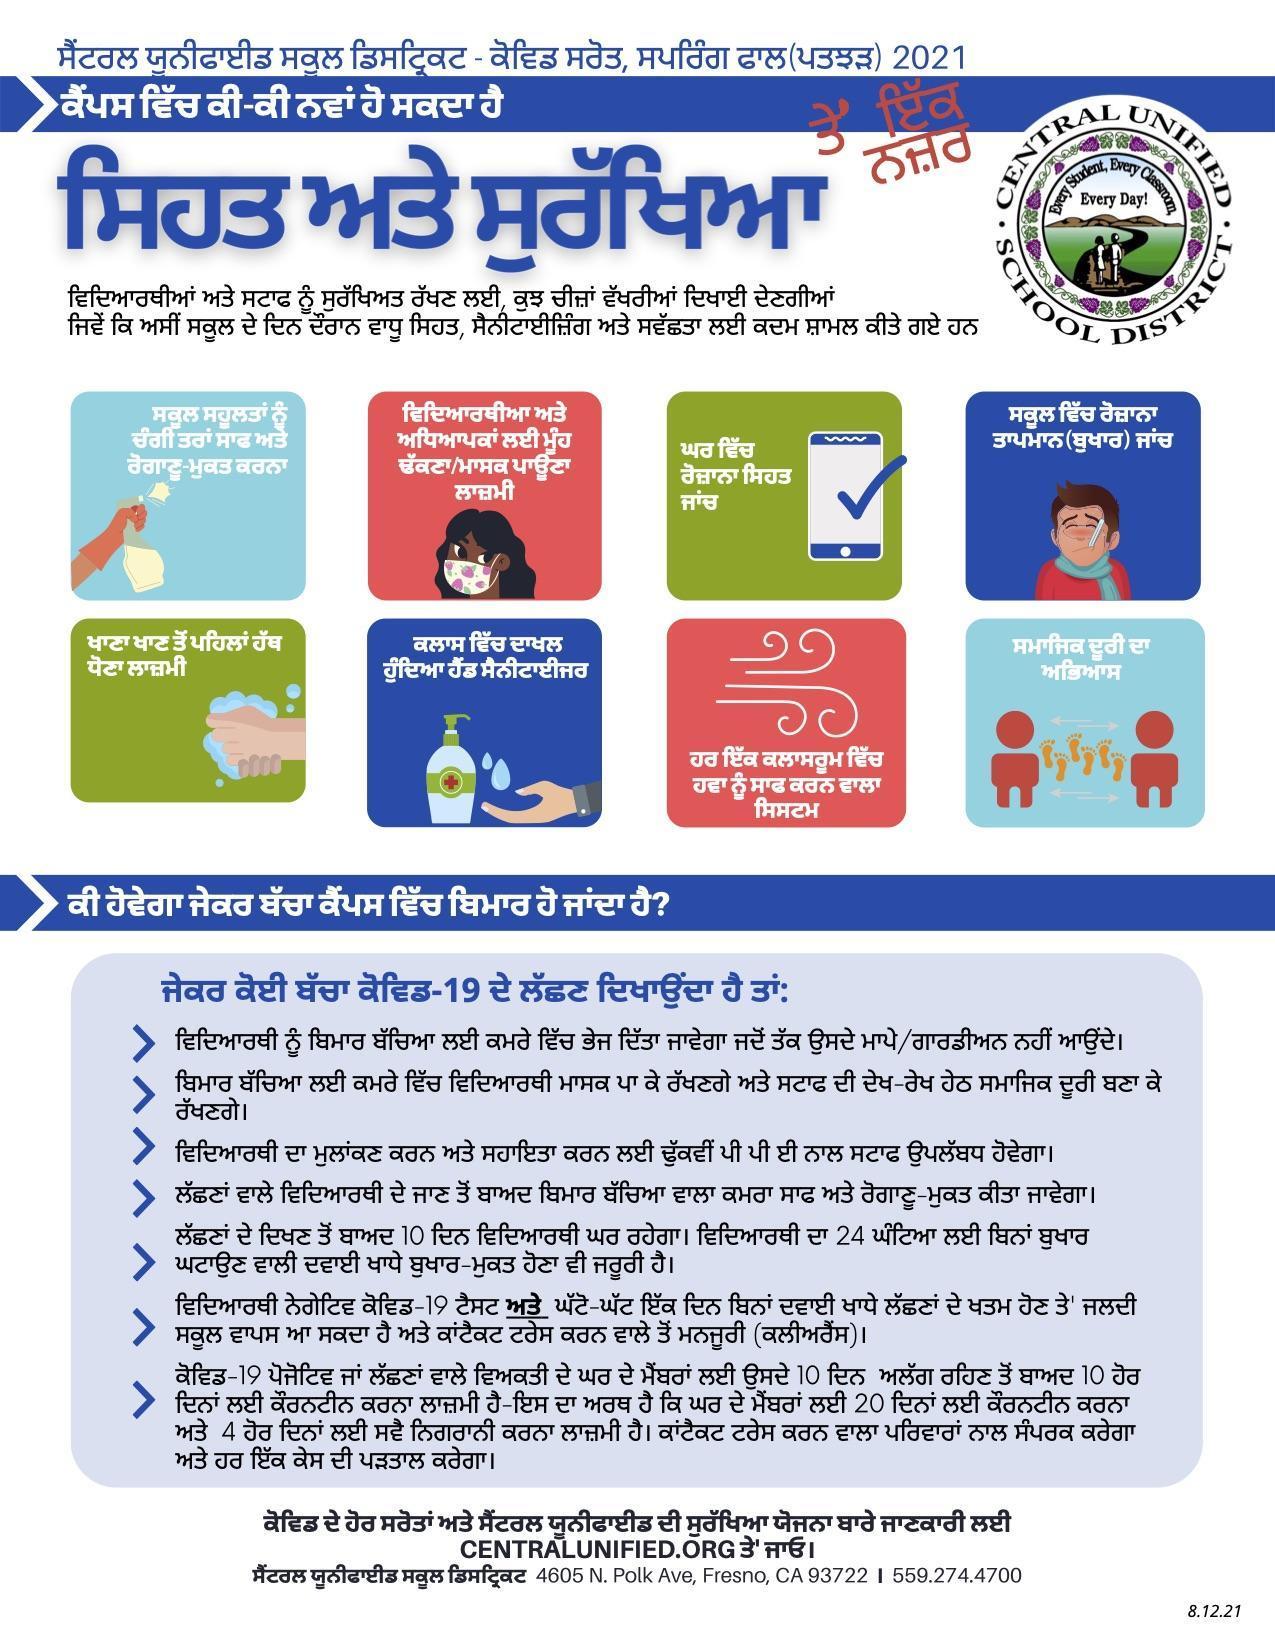 (Punjabi) Health and Safety